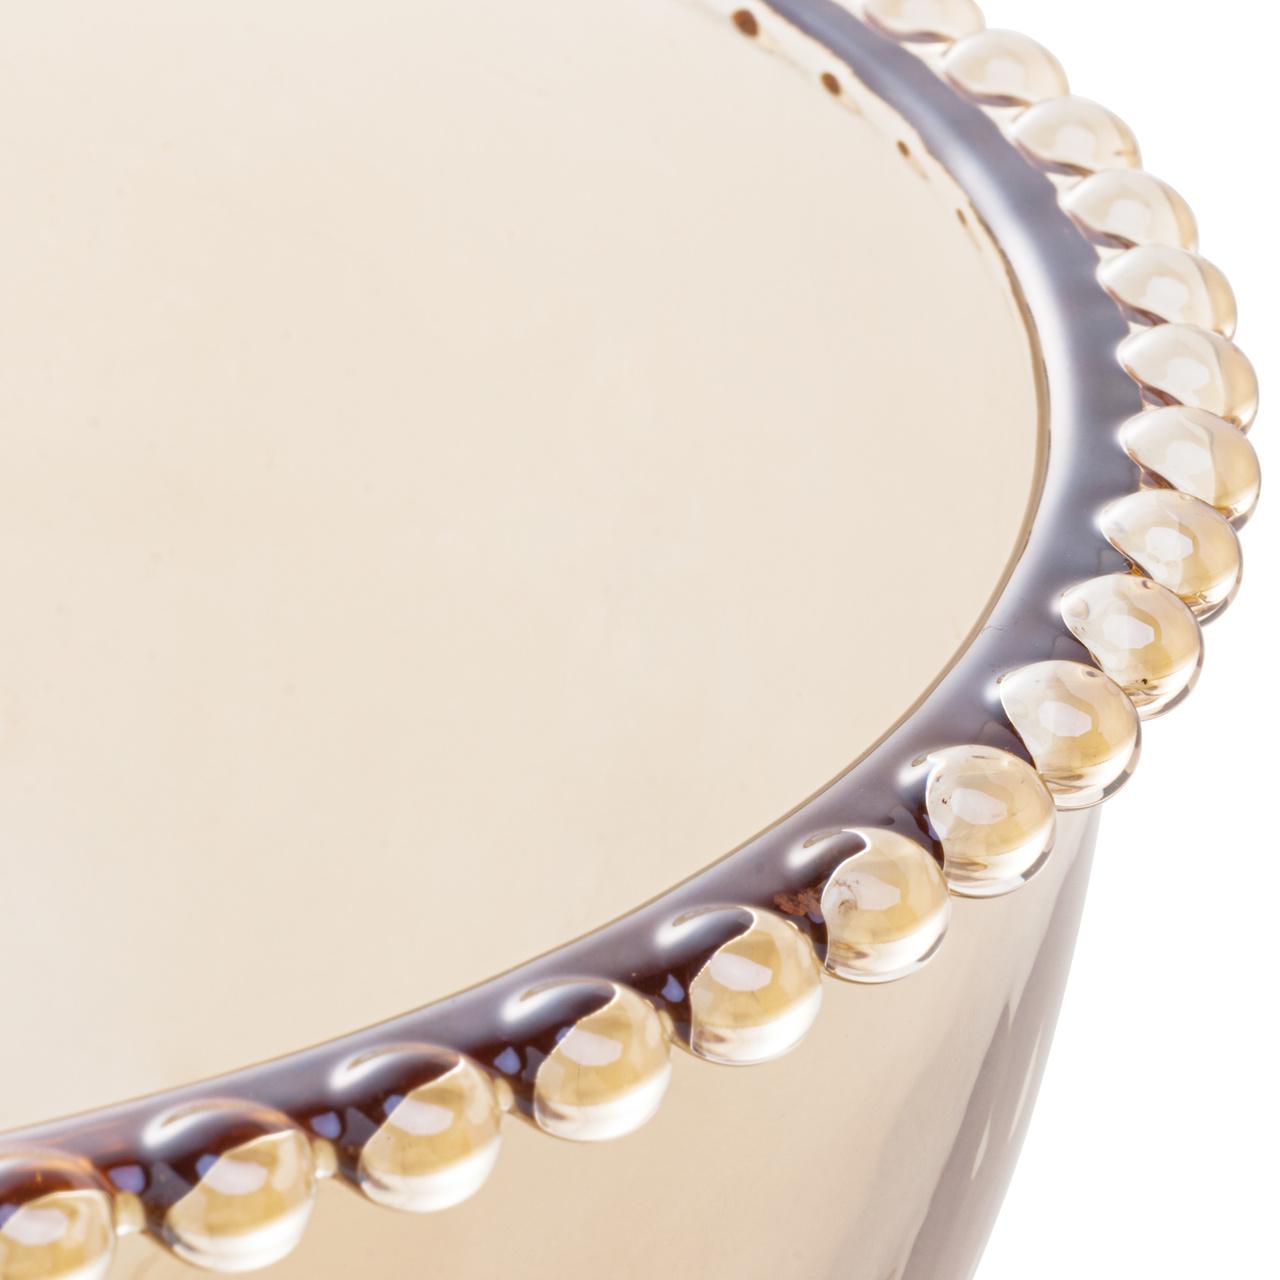 Saladeira 21 cm de cristal âmbar Pearl Wolff - 28223